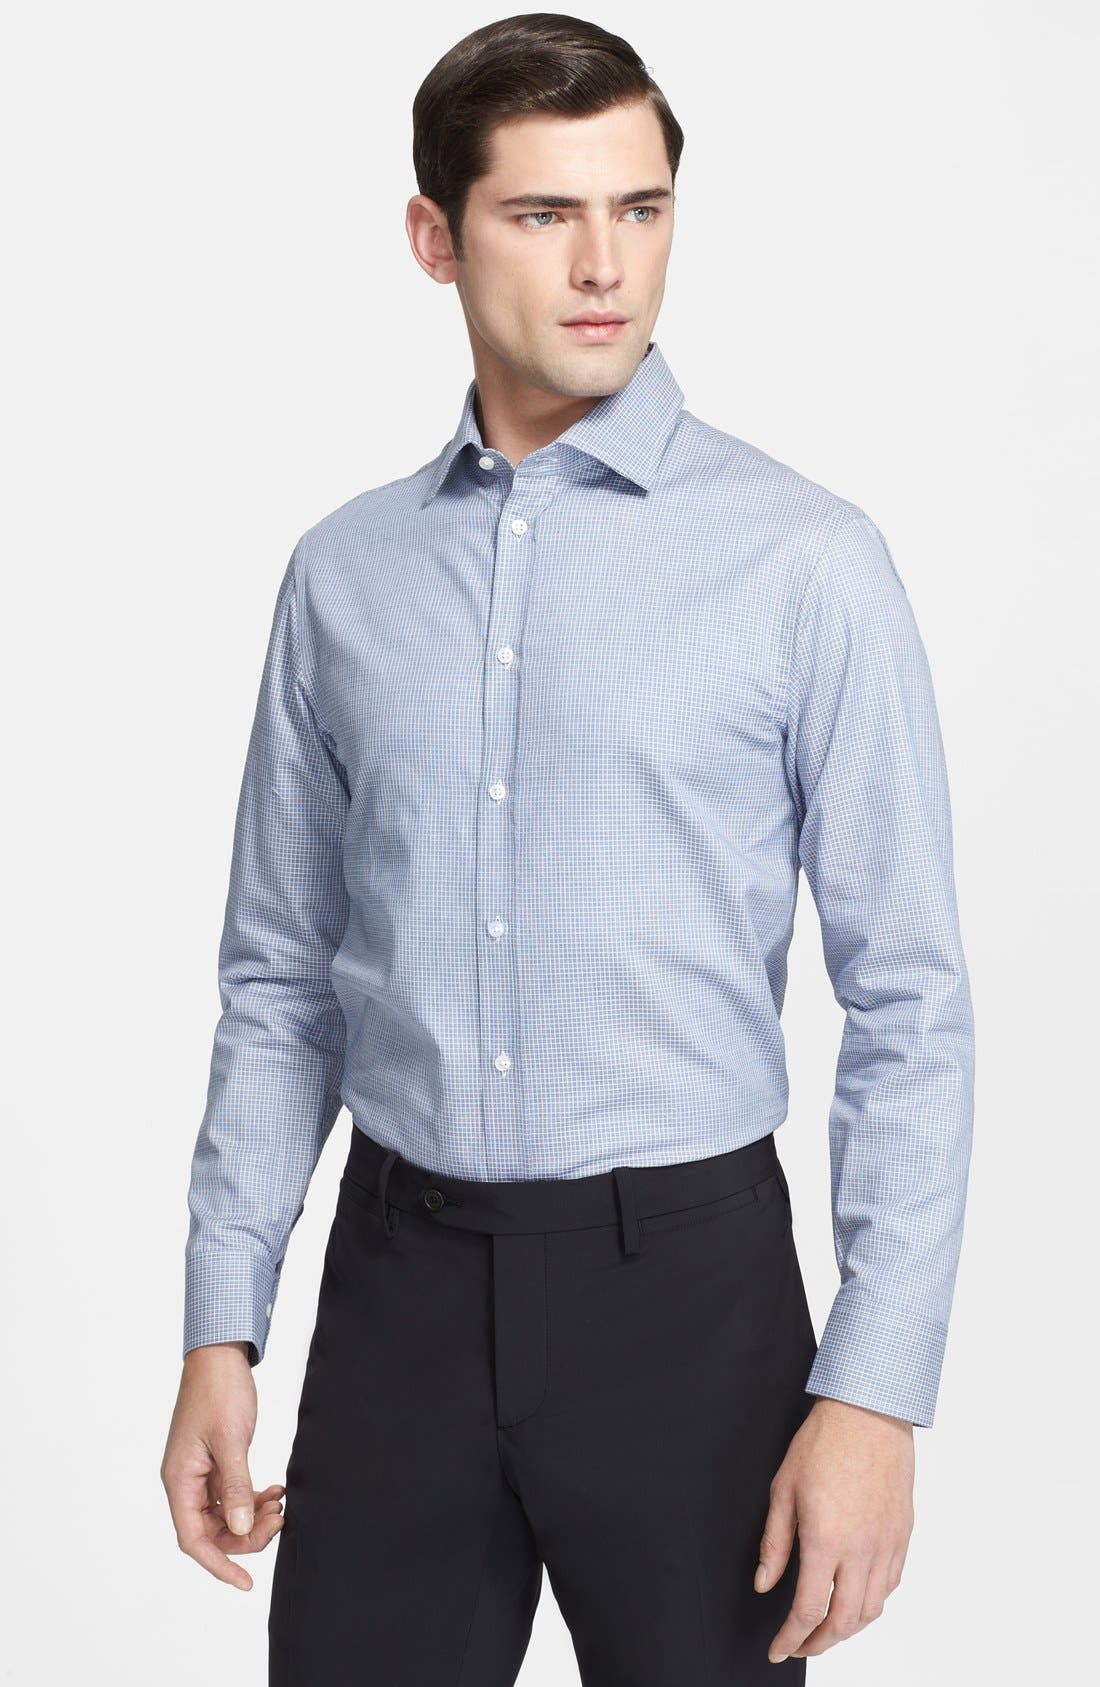 Main Image - Armani Collezioni Slim Fit Check Grid Dress Shirt